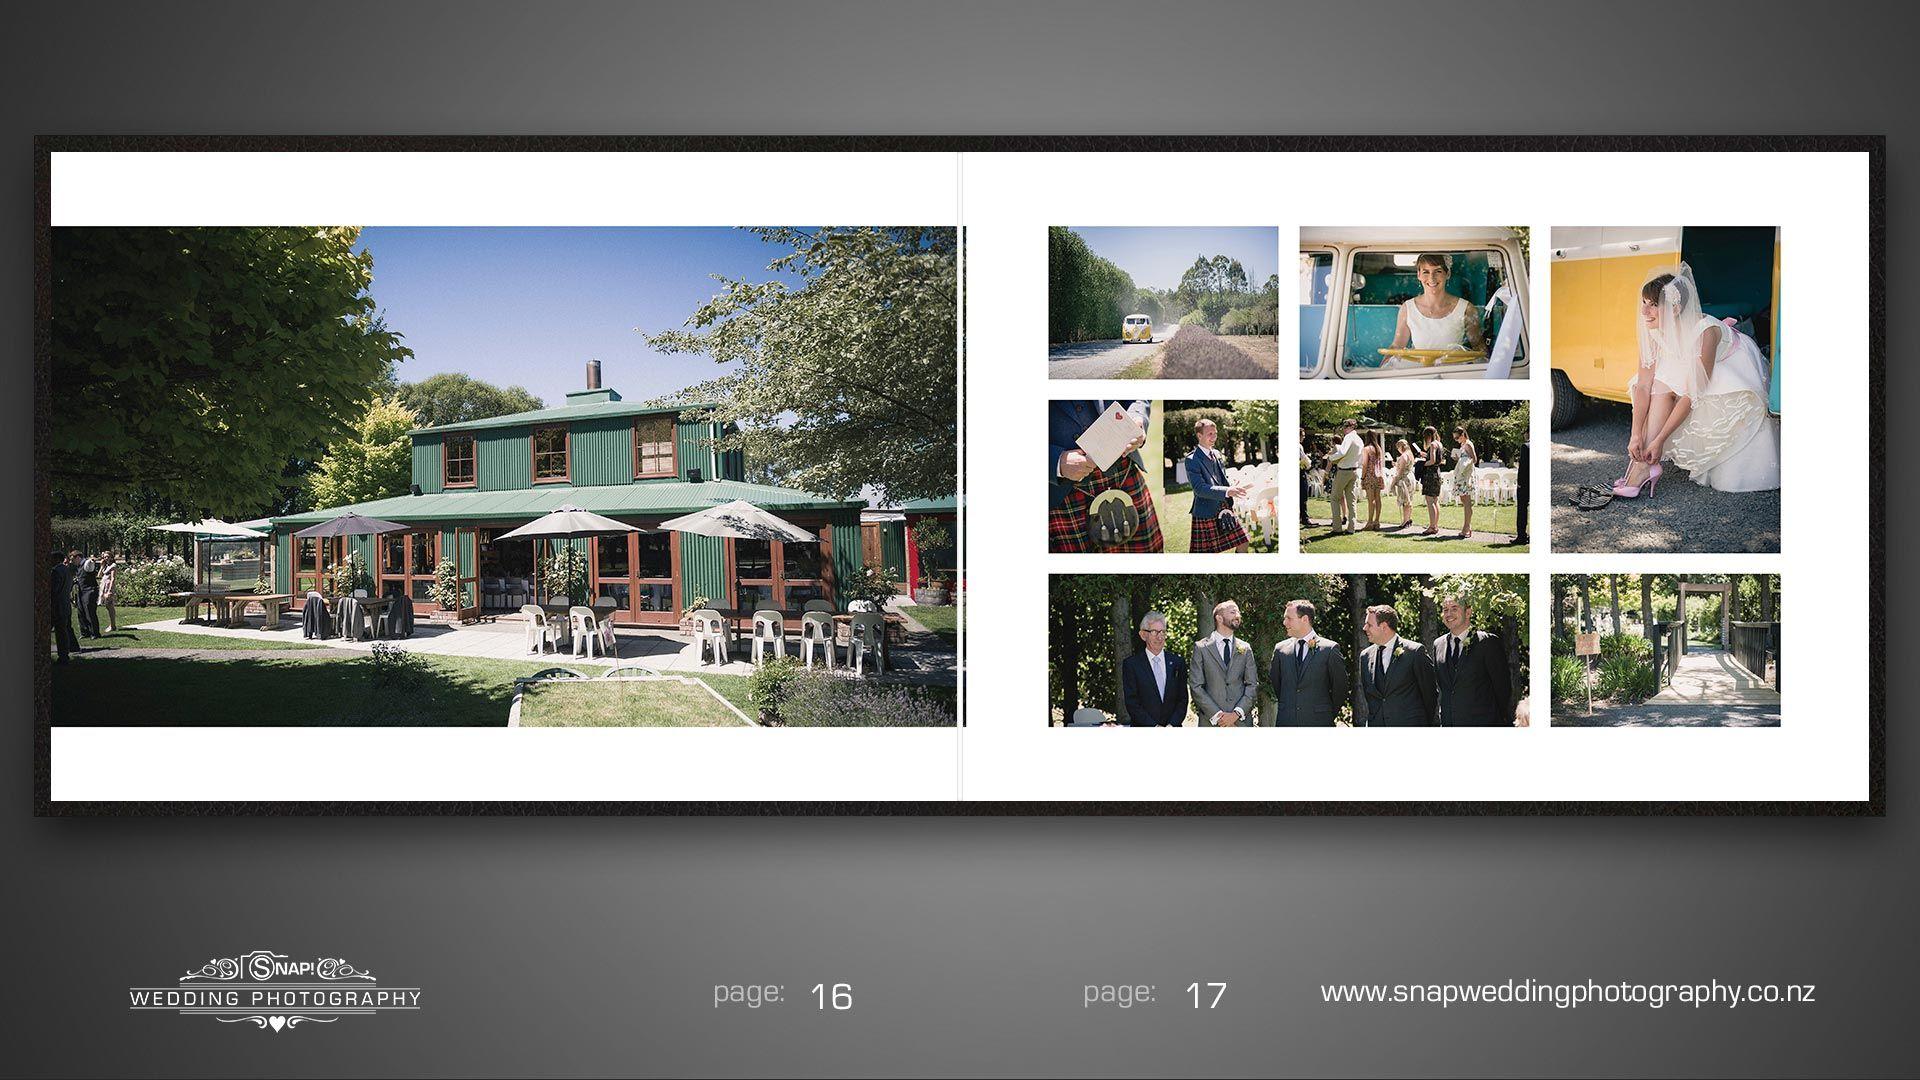 Wedding Album Design From Wedding Photography At Langdales Vineyard